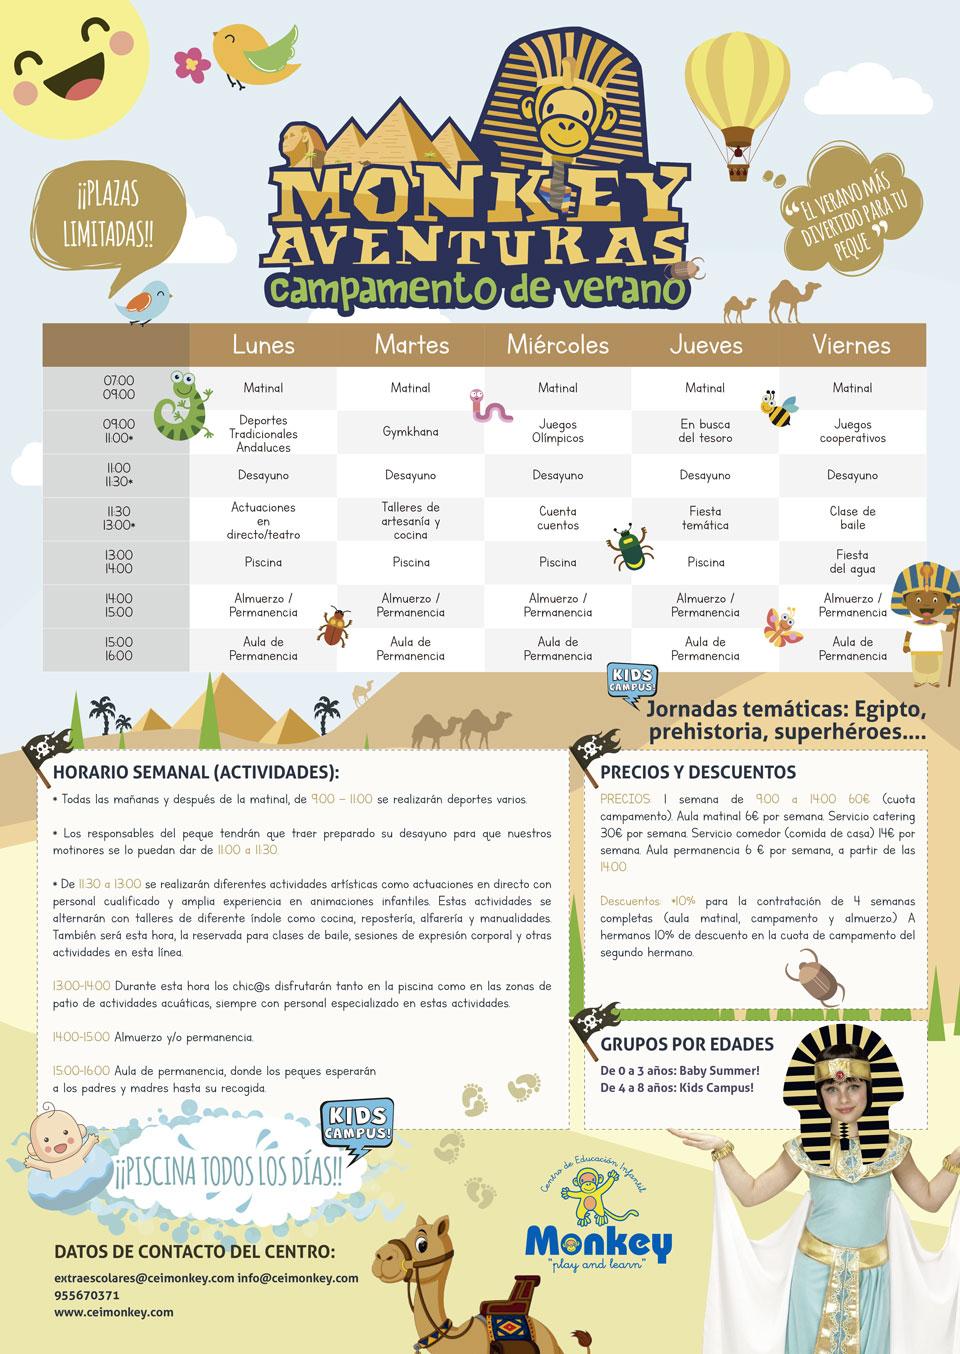 Campamento de verano Monkey Aventuras 2018 en CEI Monkey